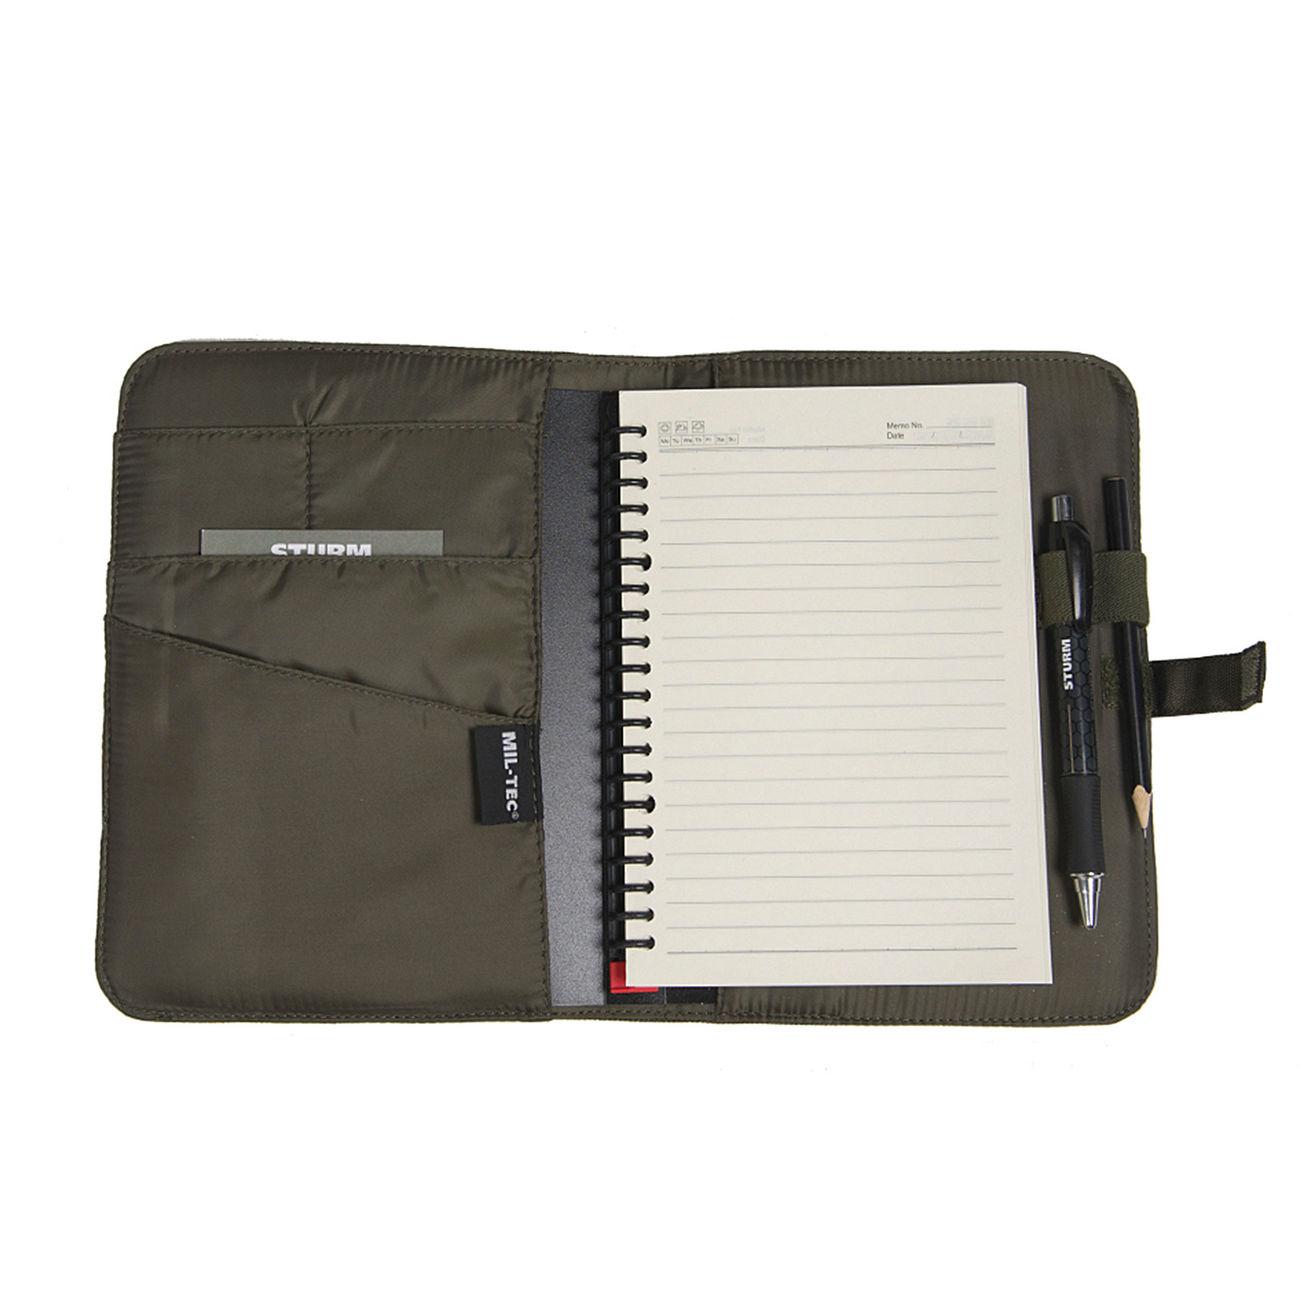 Notebooktaschen Mil-tec Tactical Notebook Medium Schwarz Notizbuch